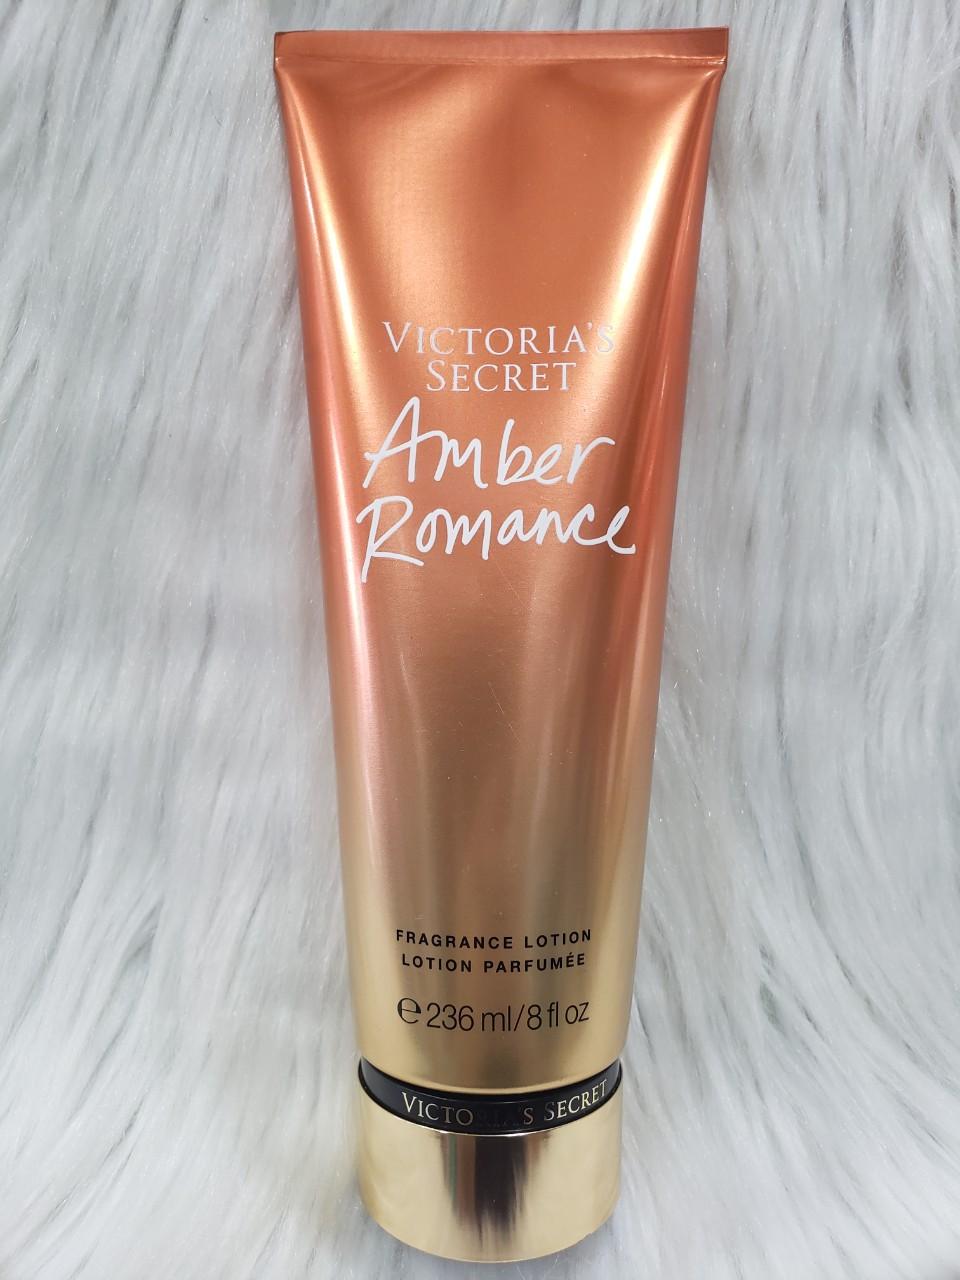 [HCM]Sữa dưỡng thể Victoria's Secret Amber Romance Fragrance Lotion 236ml - [MỸ]